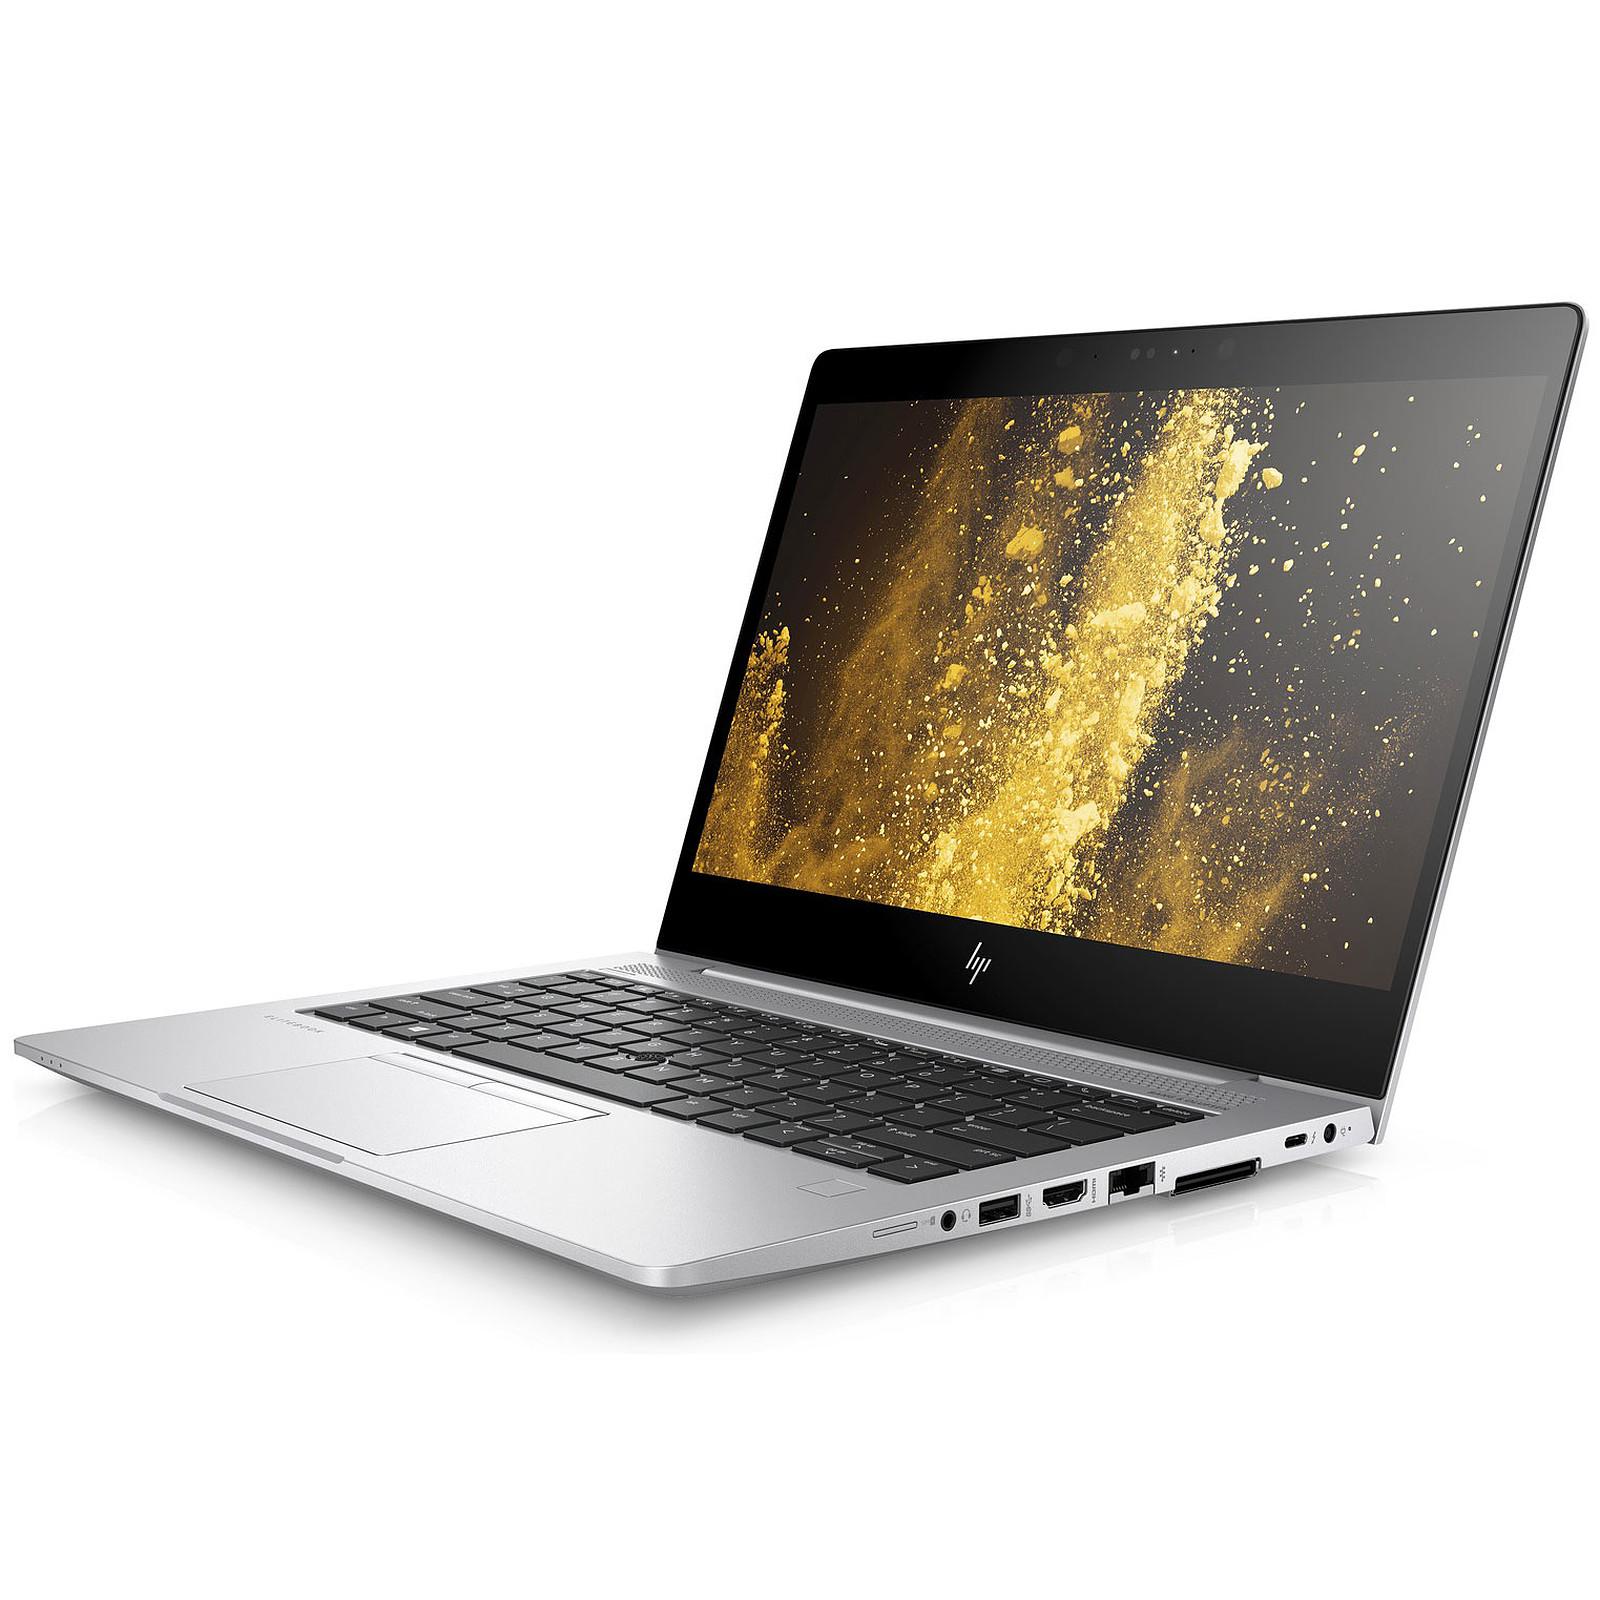 HP EliteBook 830 G6 (6XD24EA) - PC portable HP sur LDLC